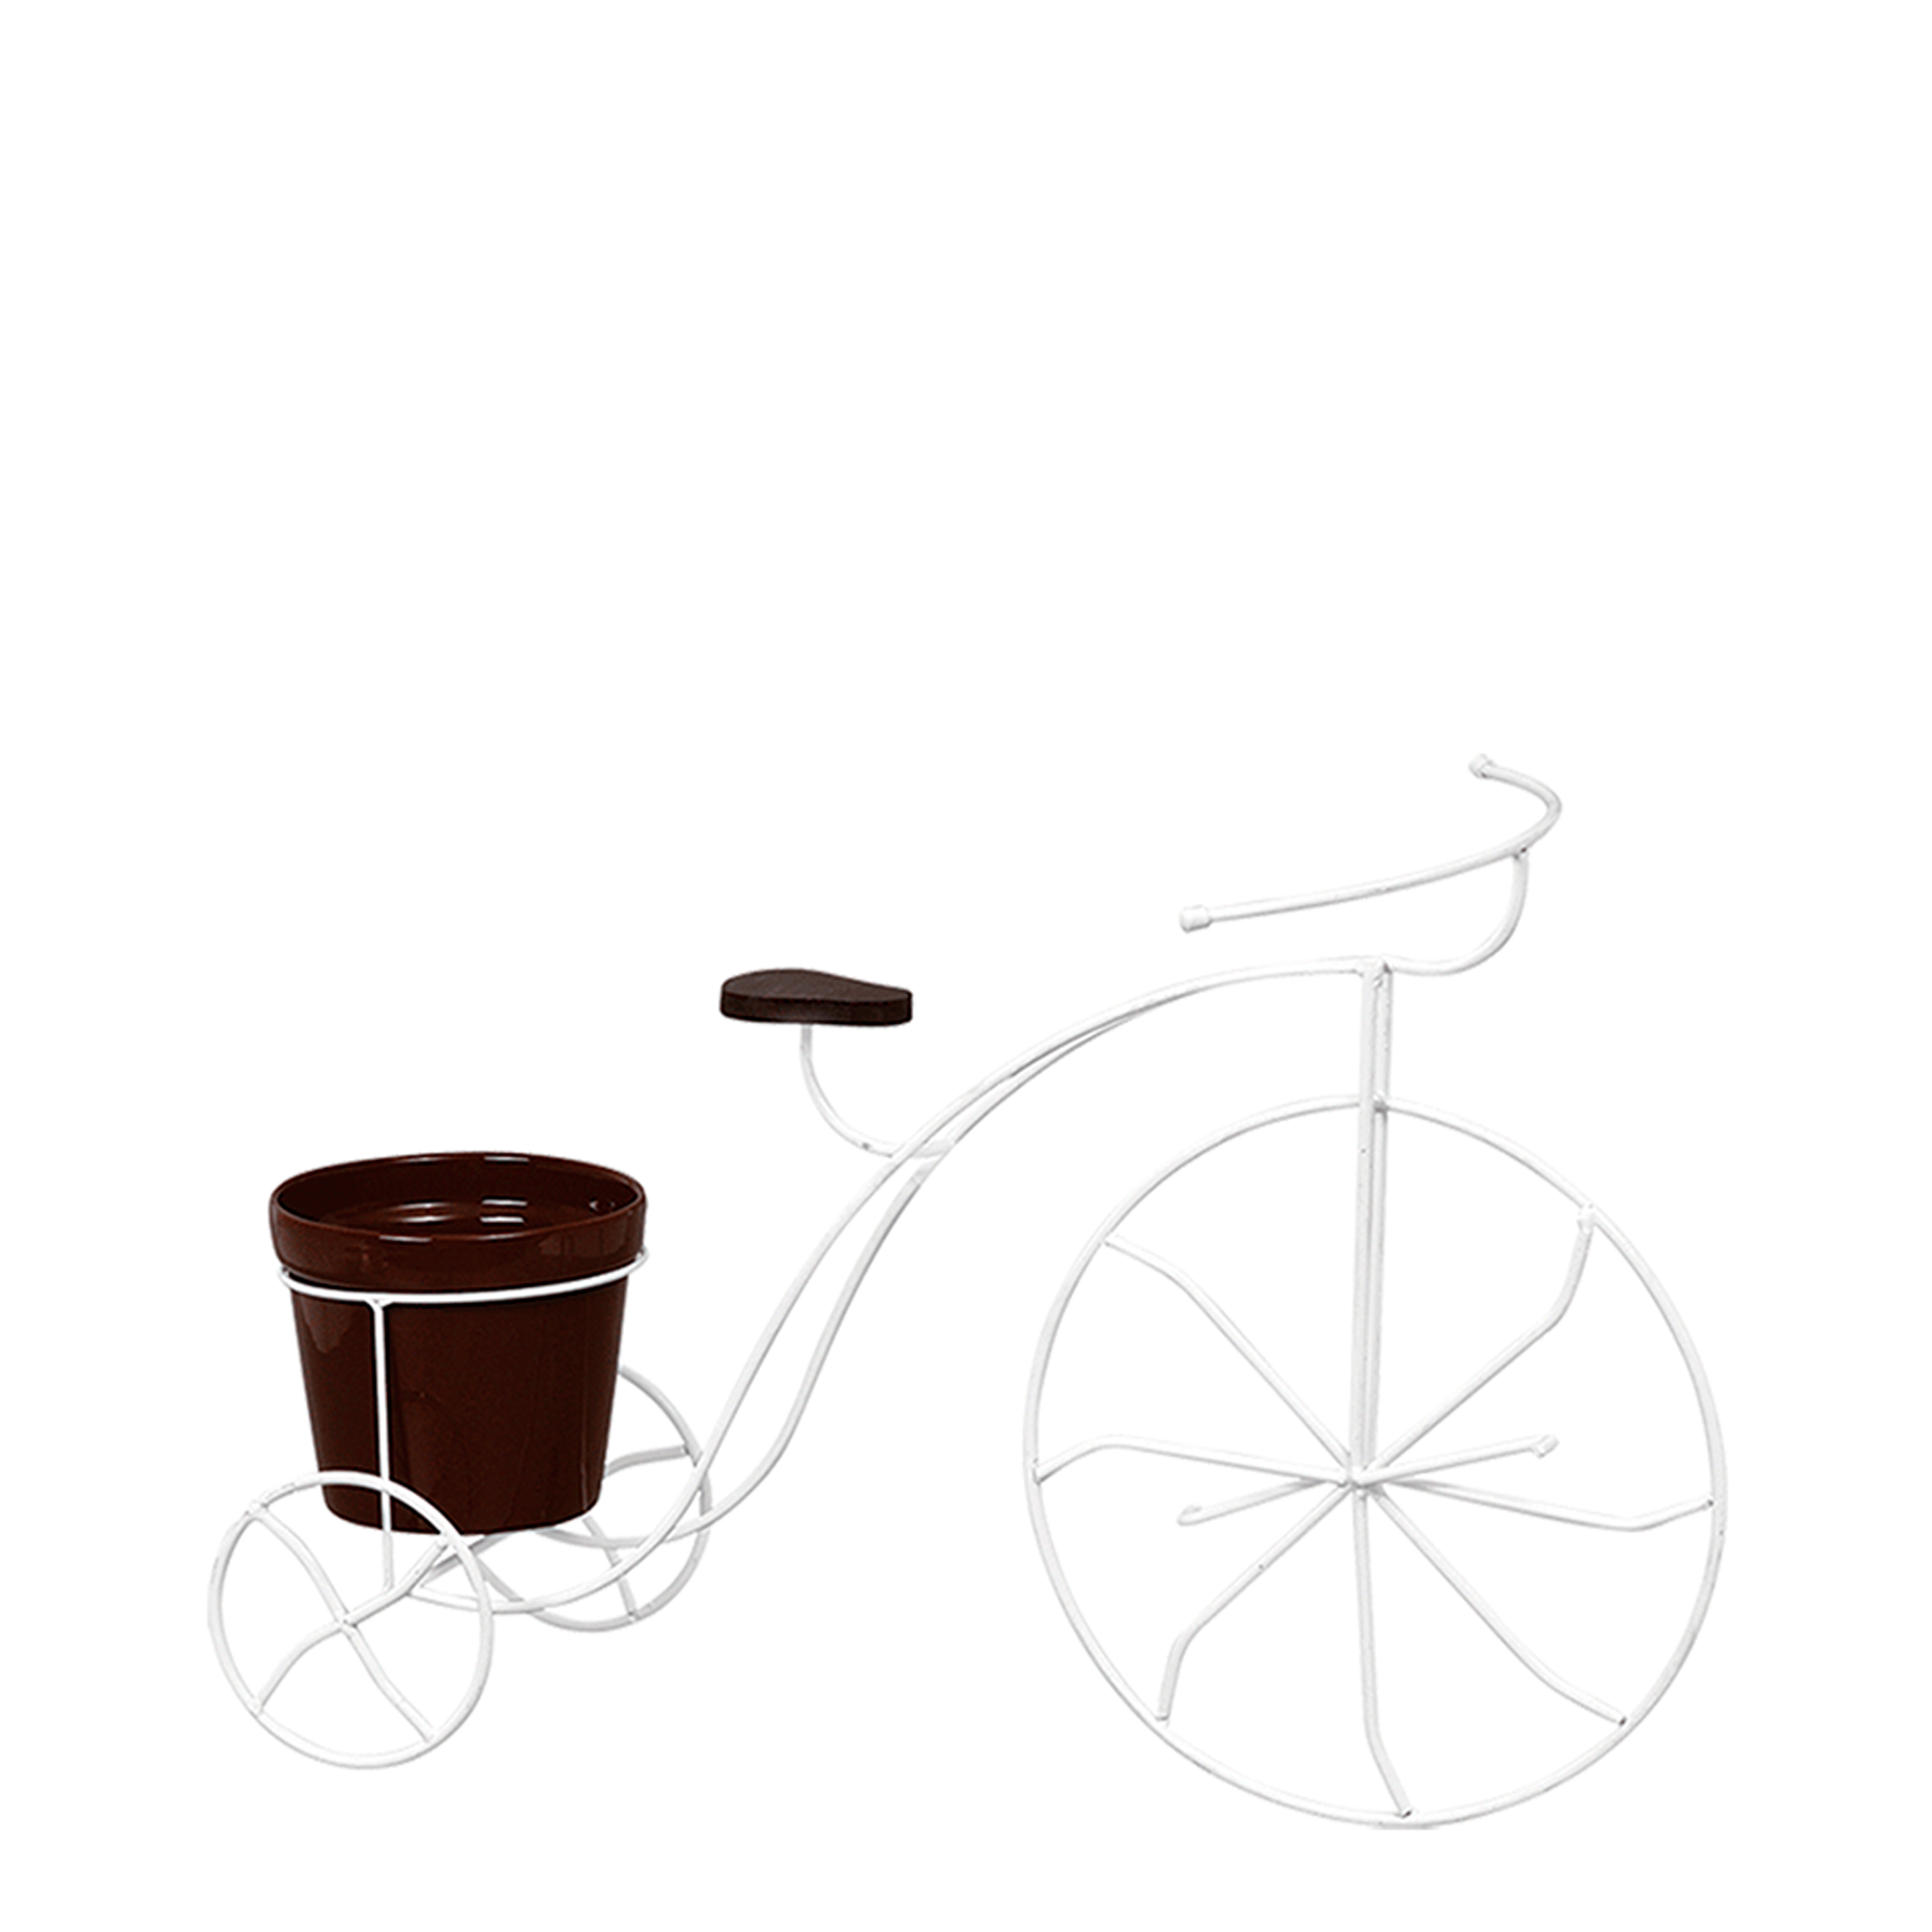 Bicicleta c/ Banco Madeira c/ 1 Vaso Grande